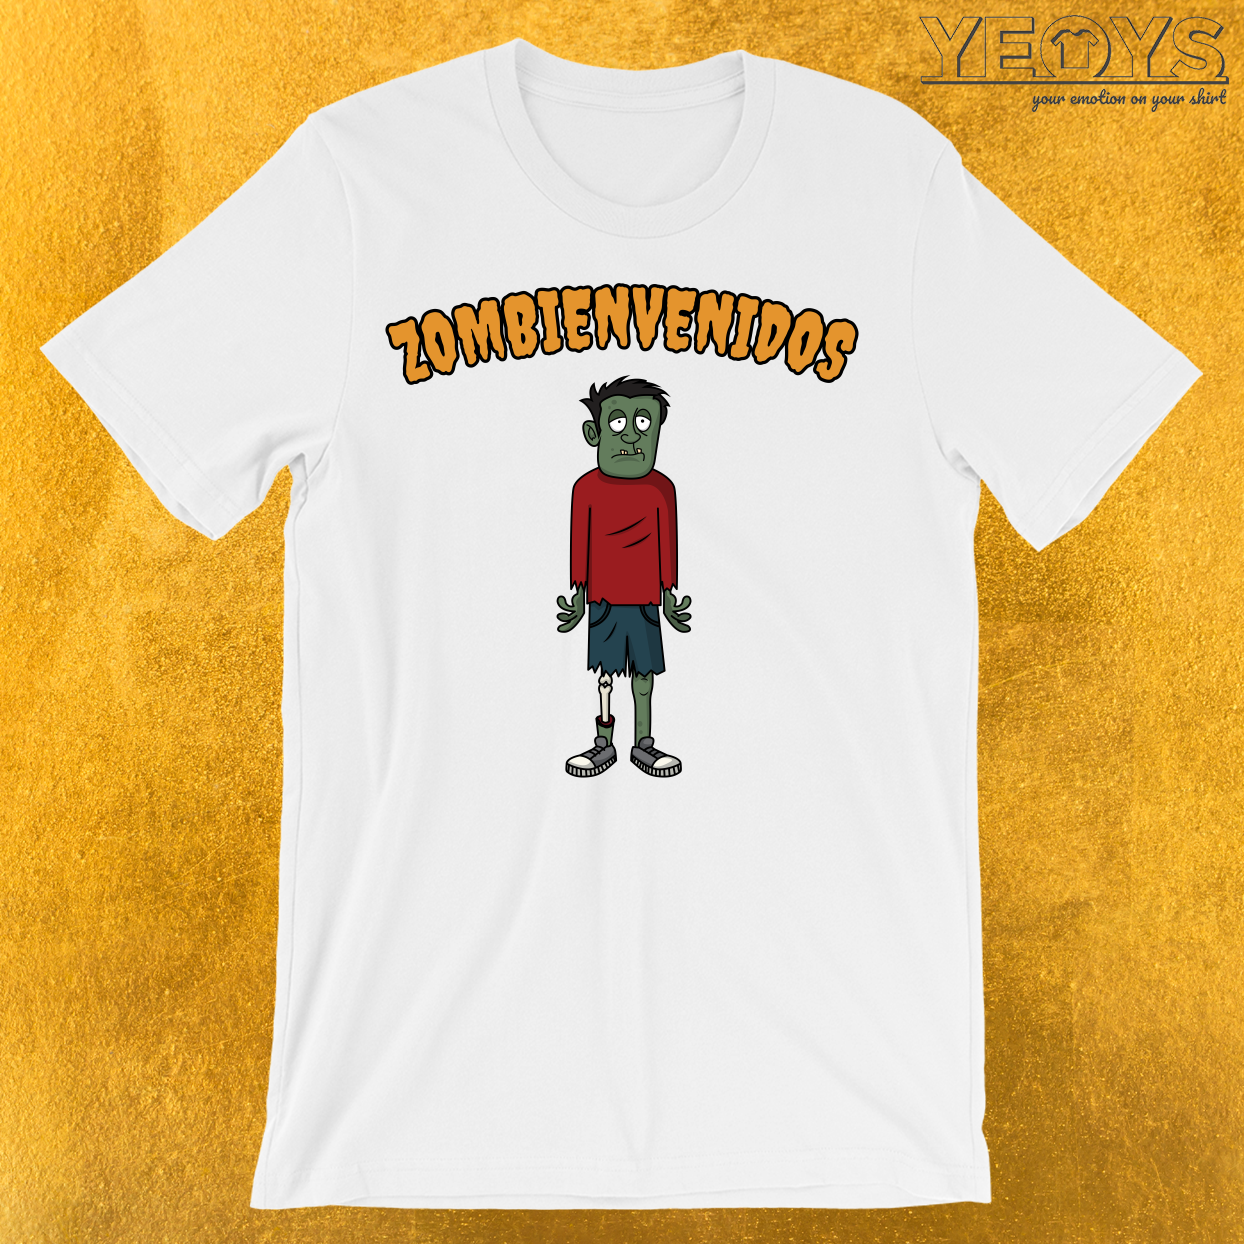 Zombienvenidos T-Shirt